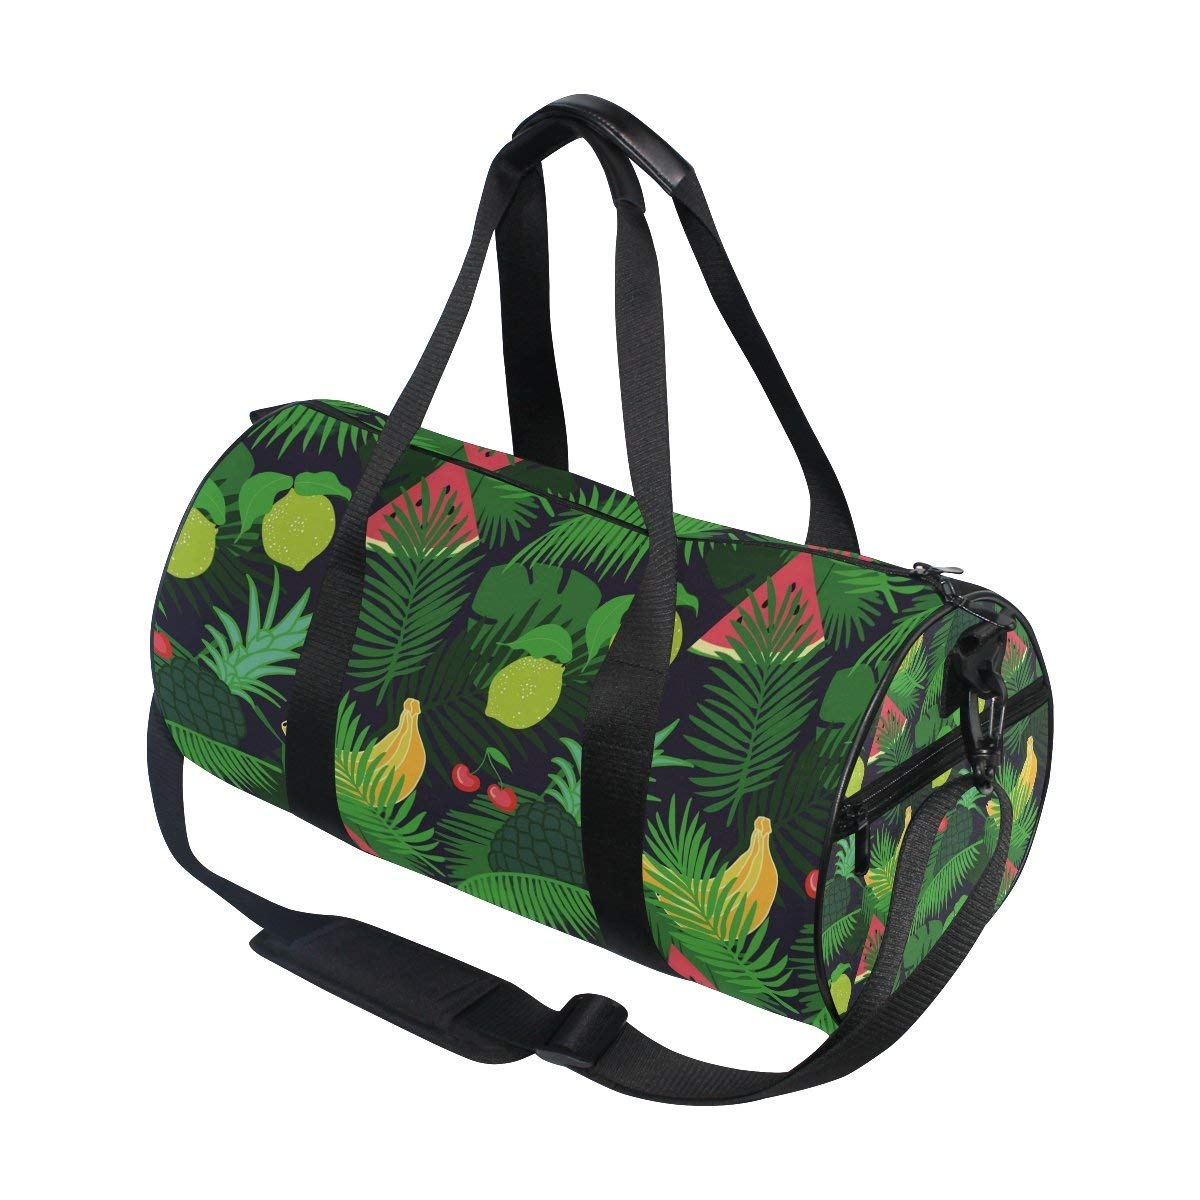 Gym Duffel Bag Watercolor Wolf Sports Lightweight Canvas Travel Luggage Bag